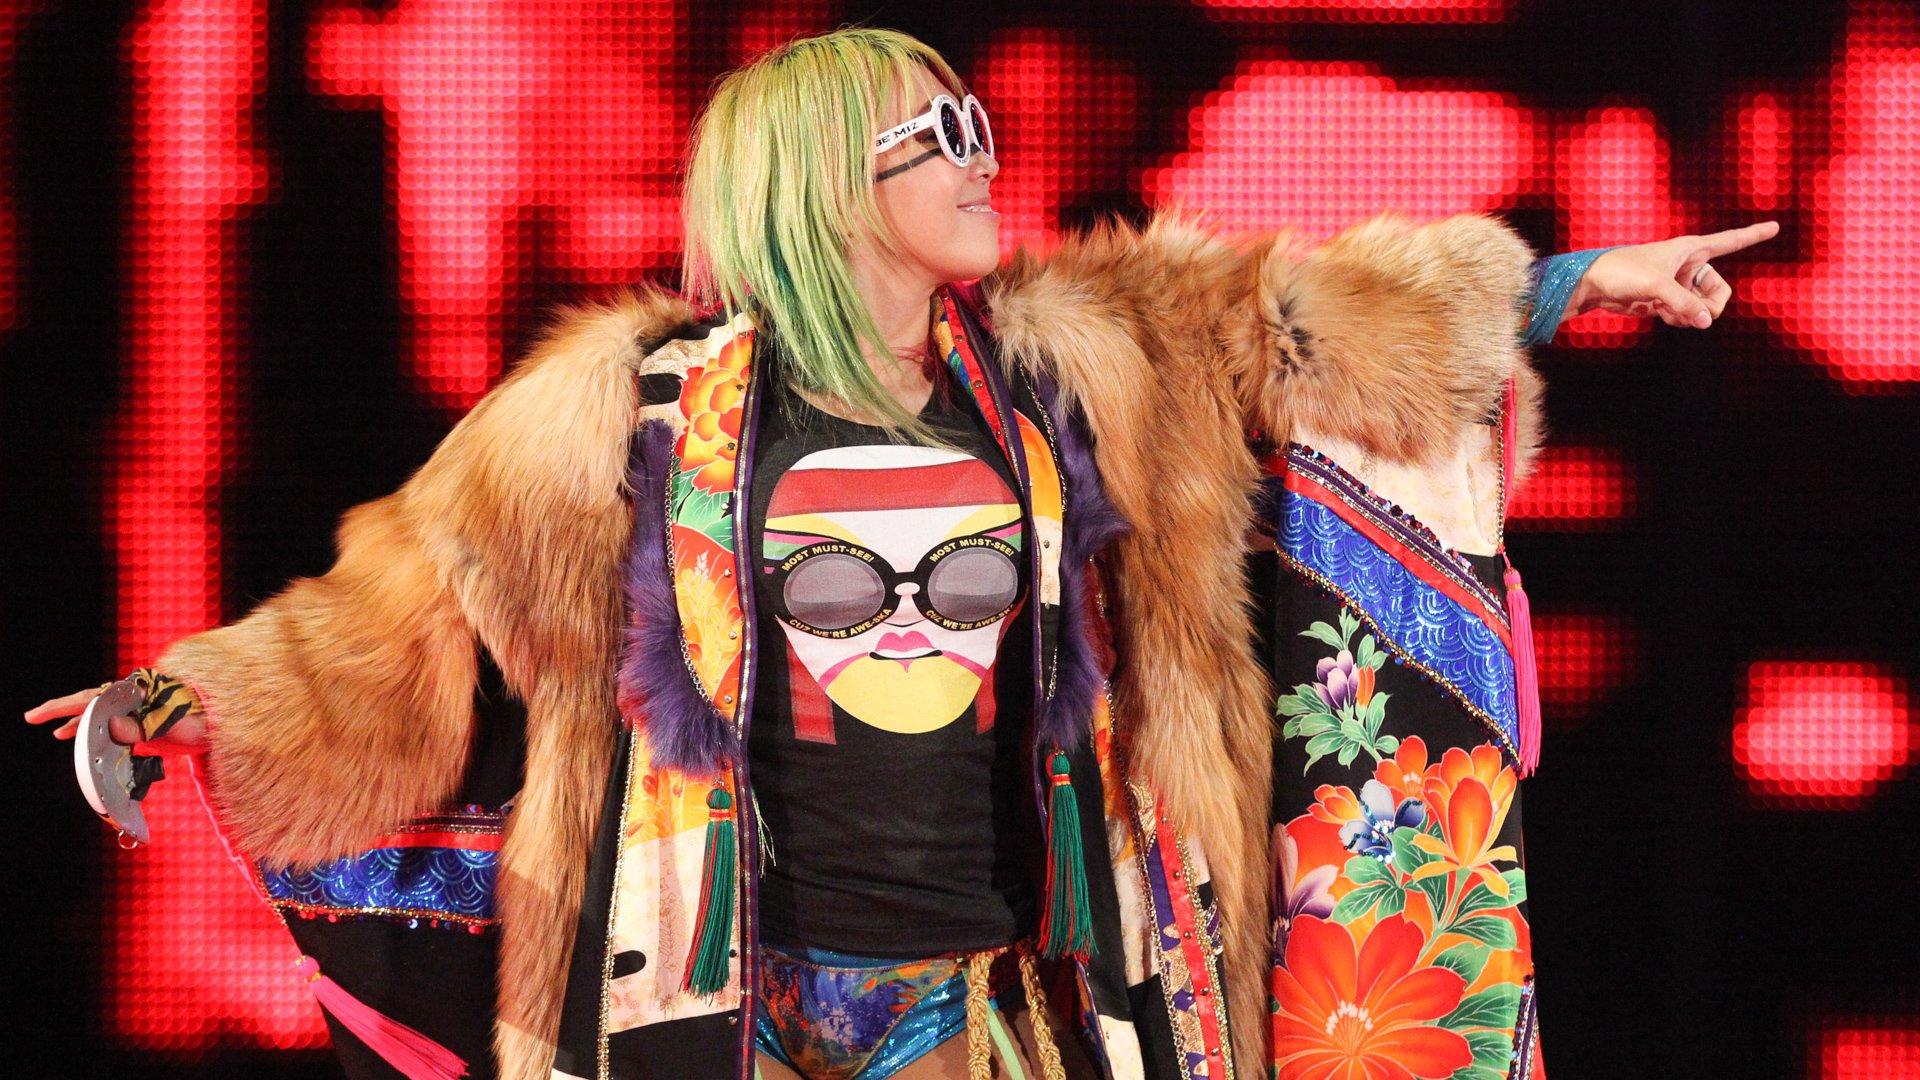 ASUKA tafka KANA Thread - Page 28 - Wrestling Forum: WWE